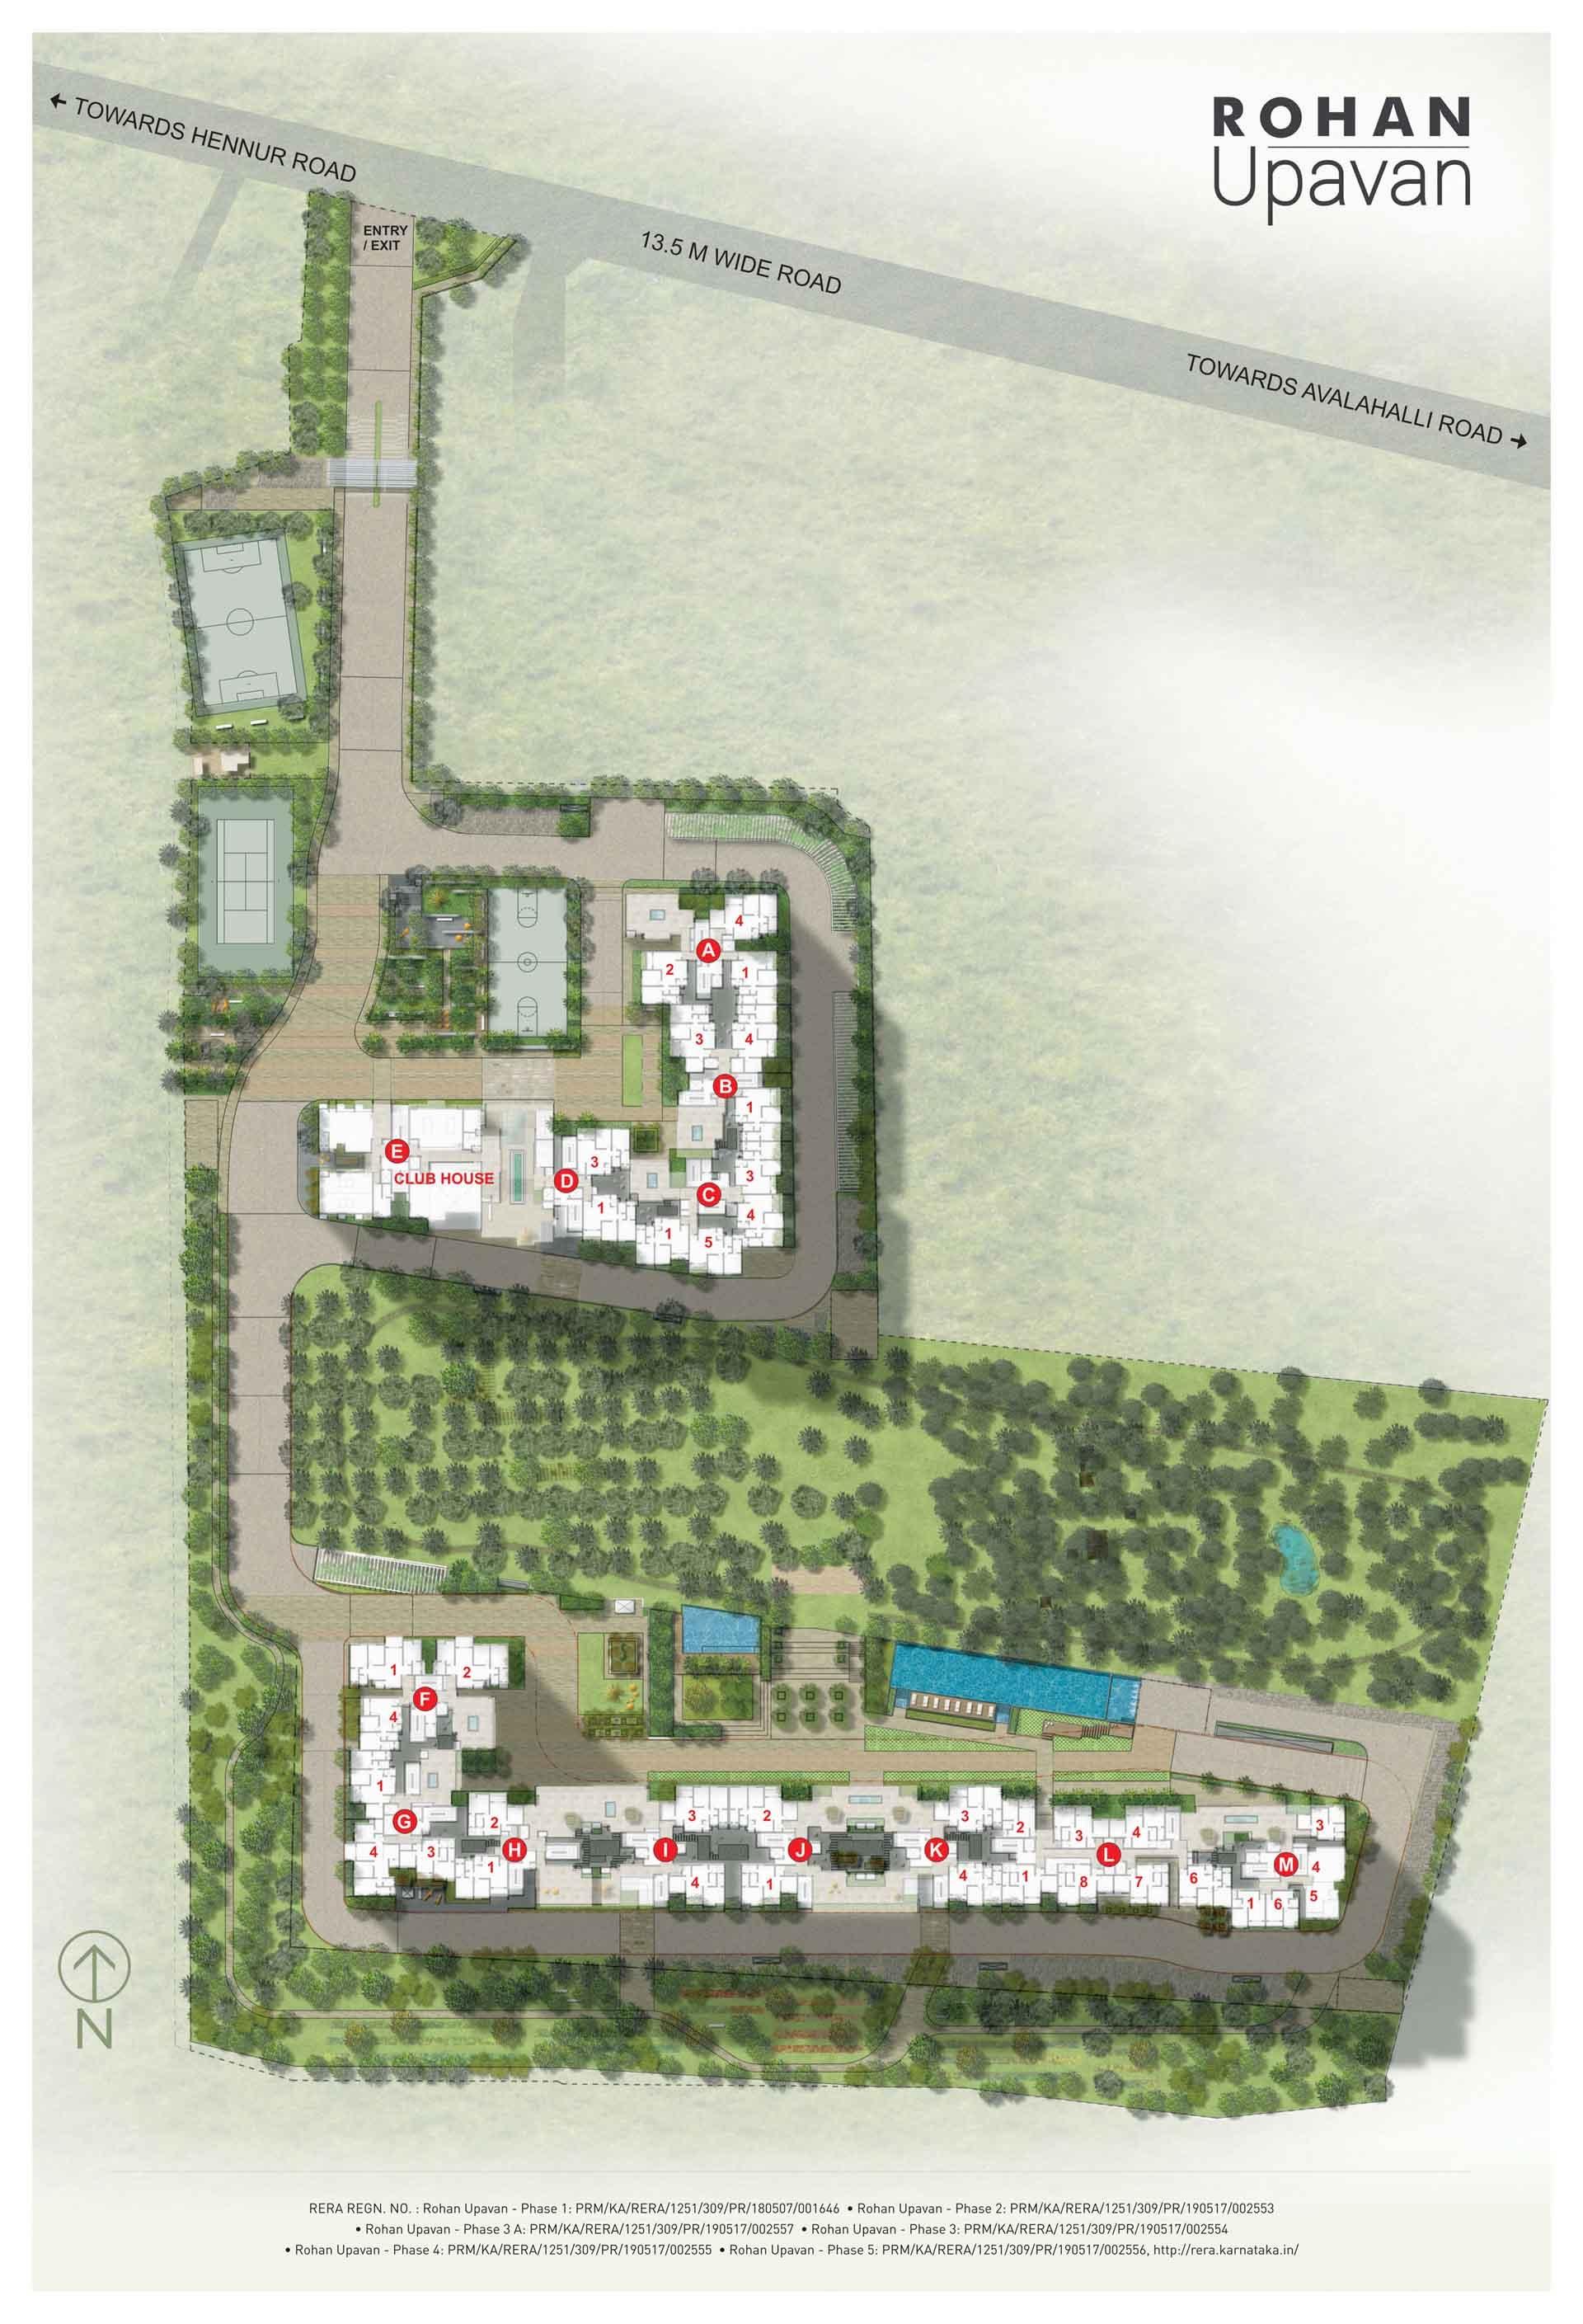 rohan upavan phase v project master plan image1